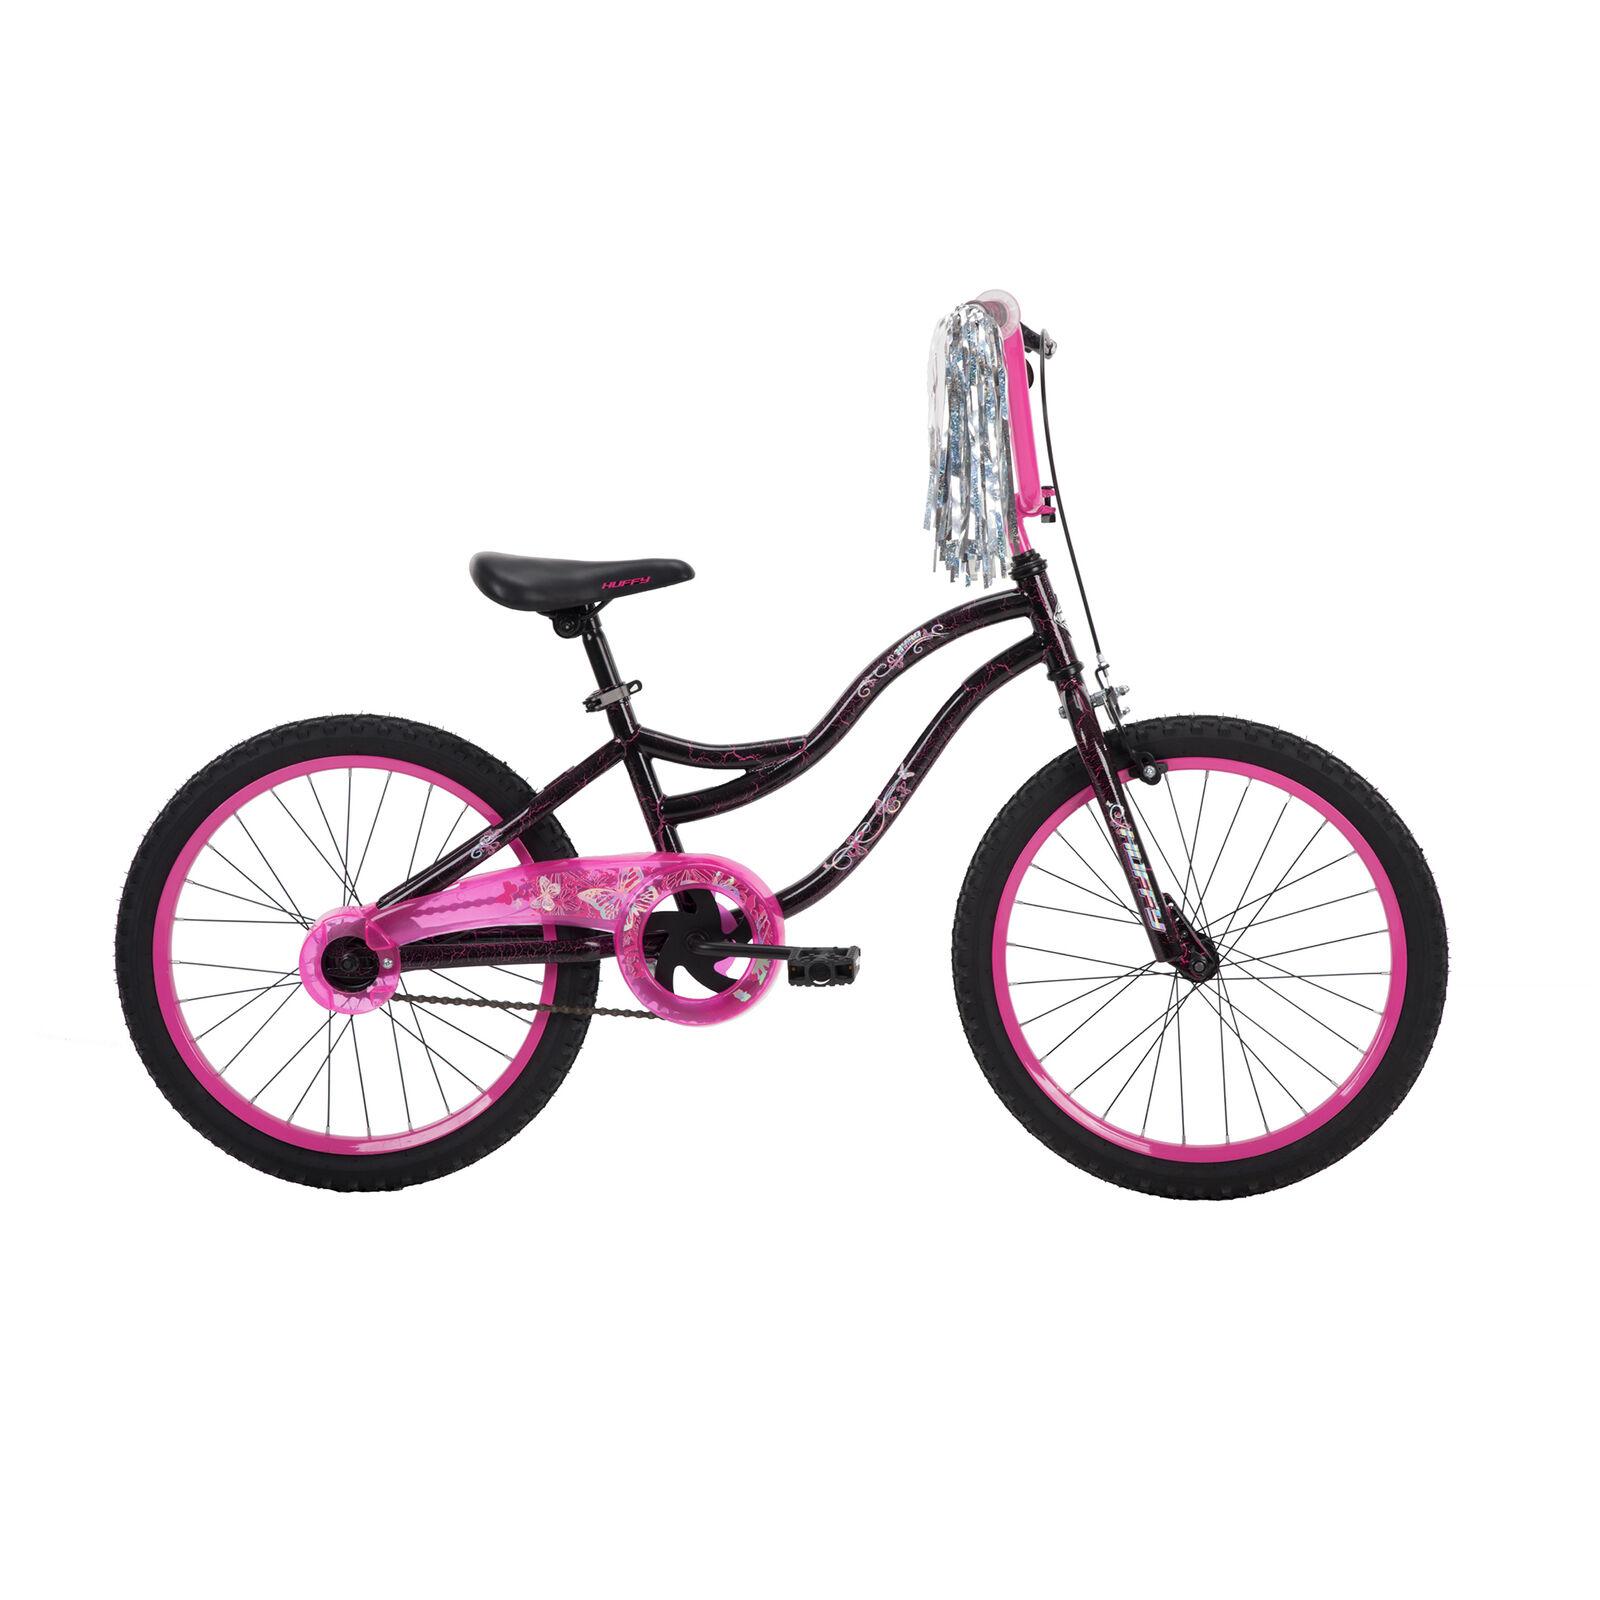 Single-Speed Huffy Kids Bike 20-inch Bicycle for Girls